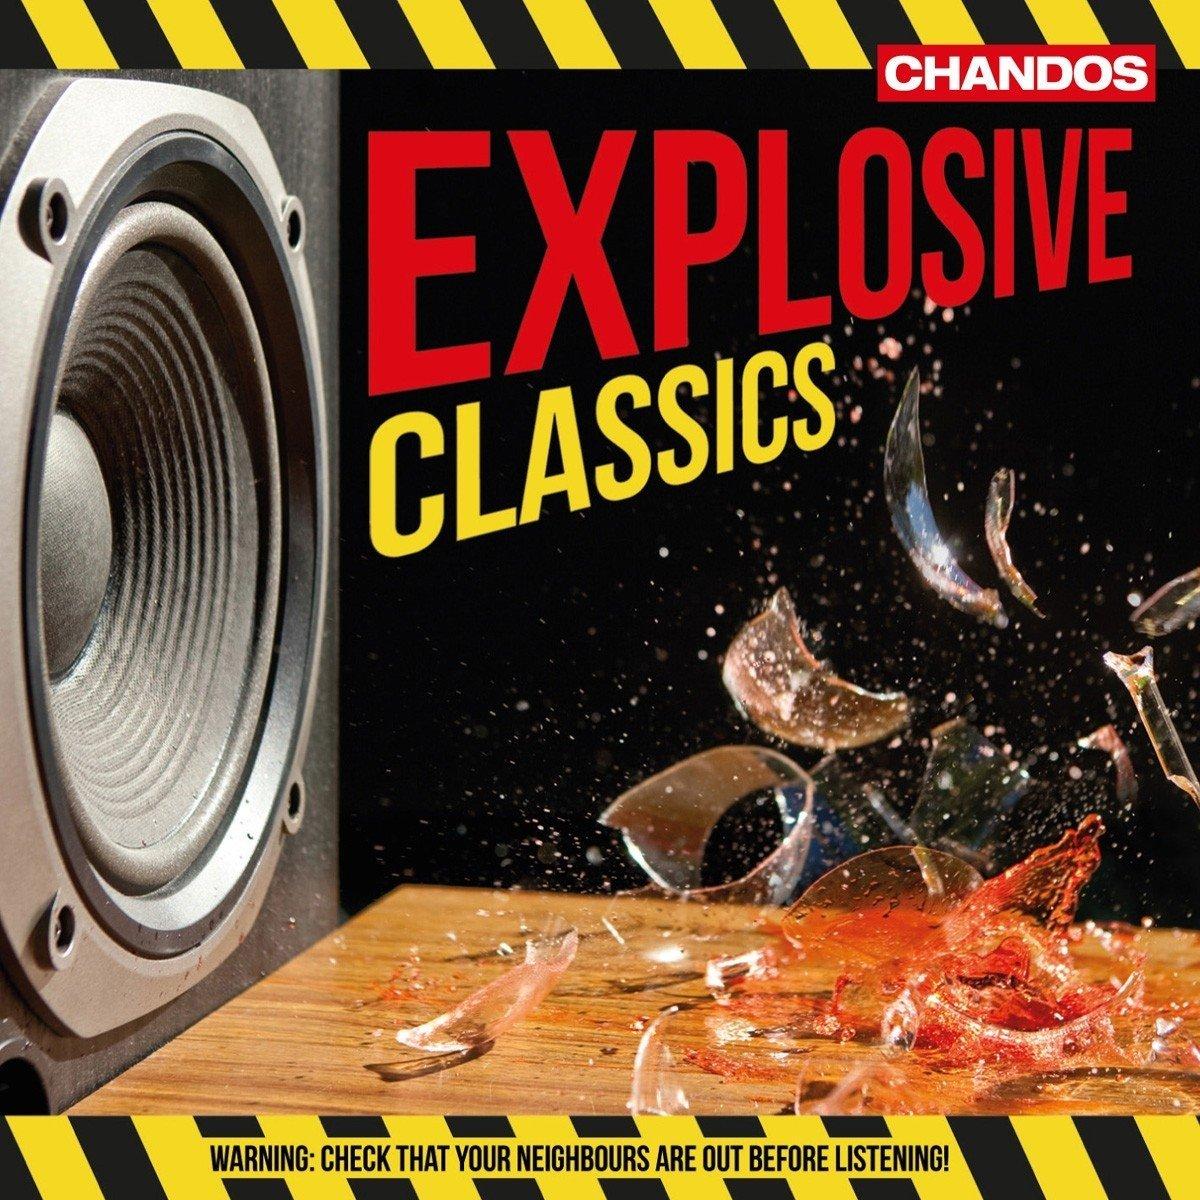 Explosive Classics